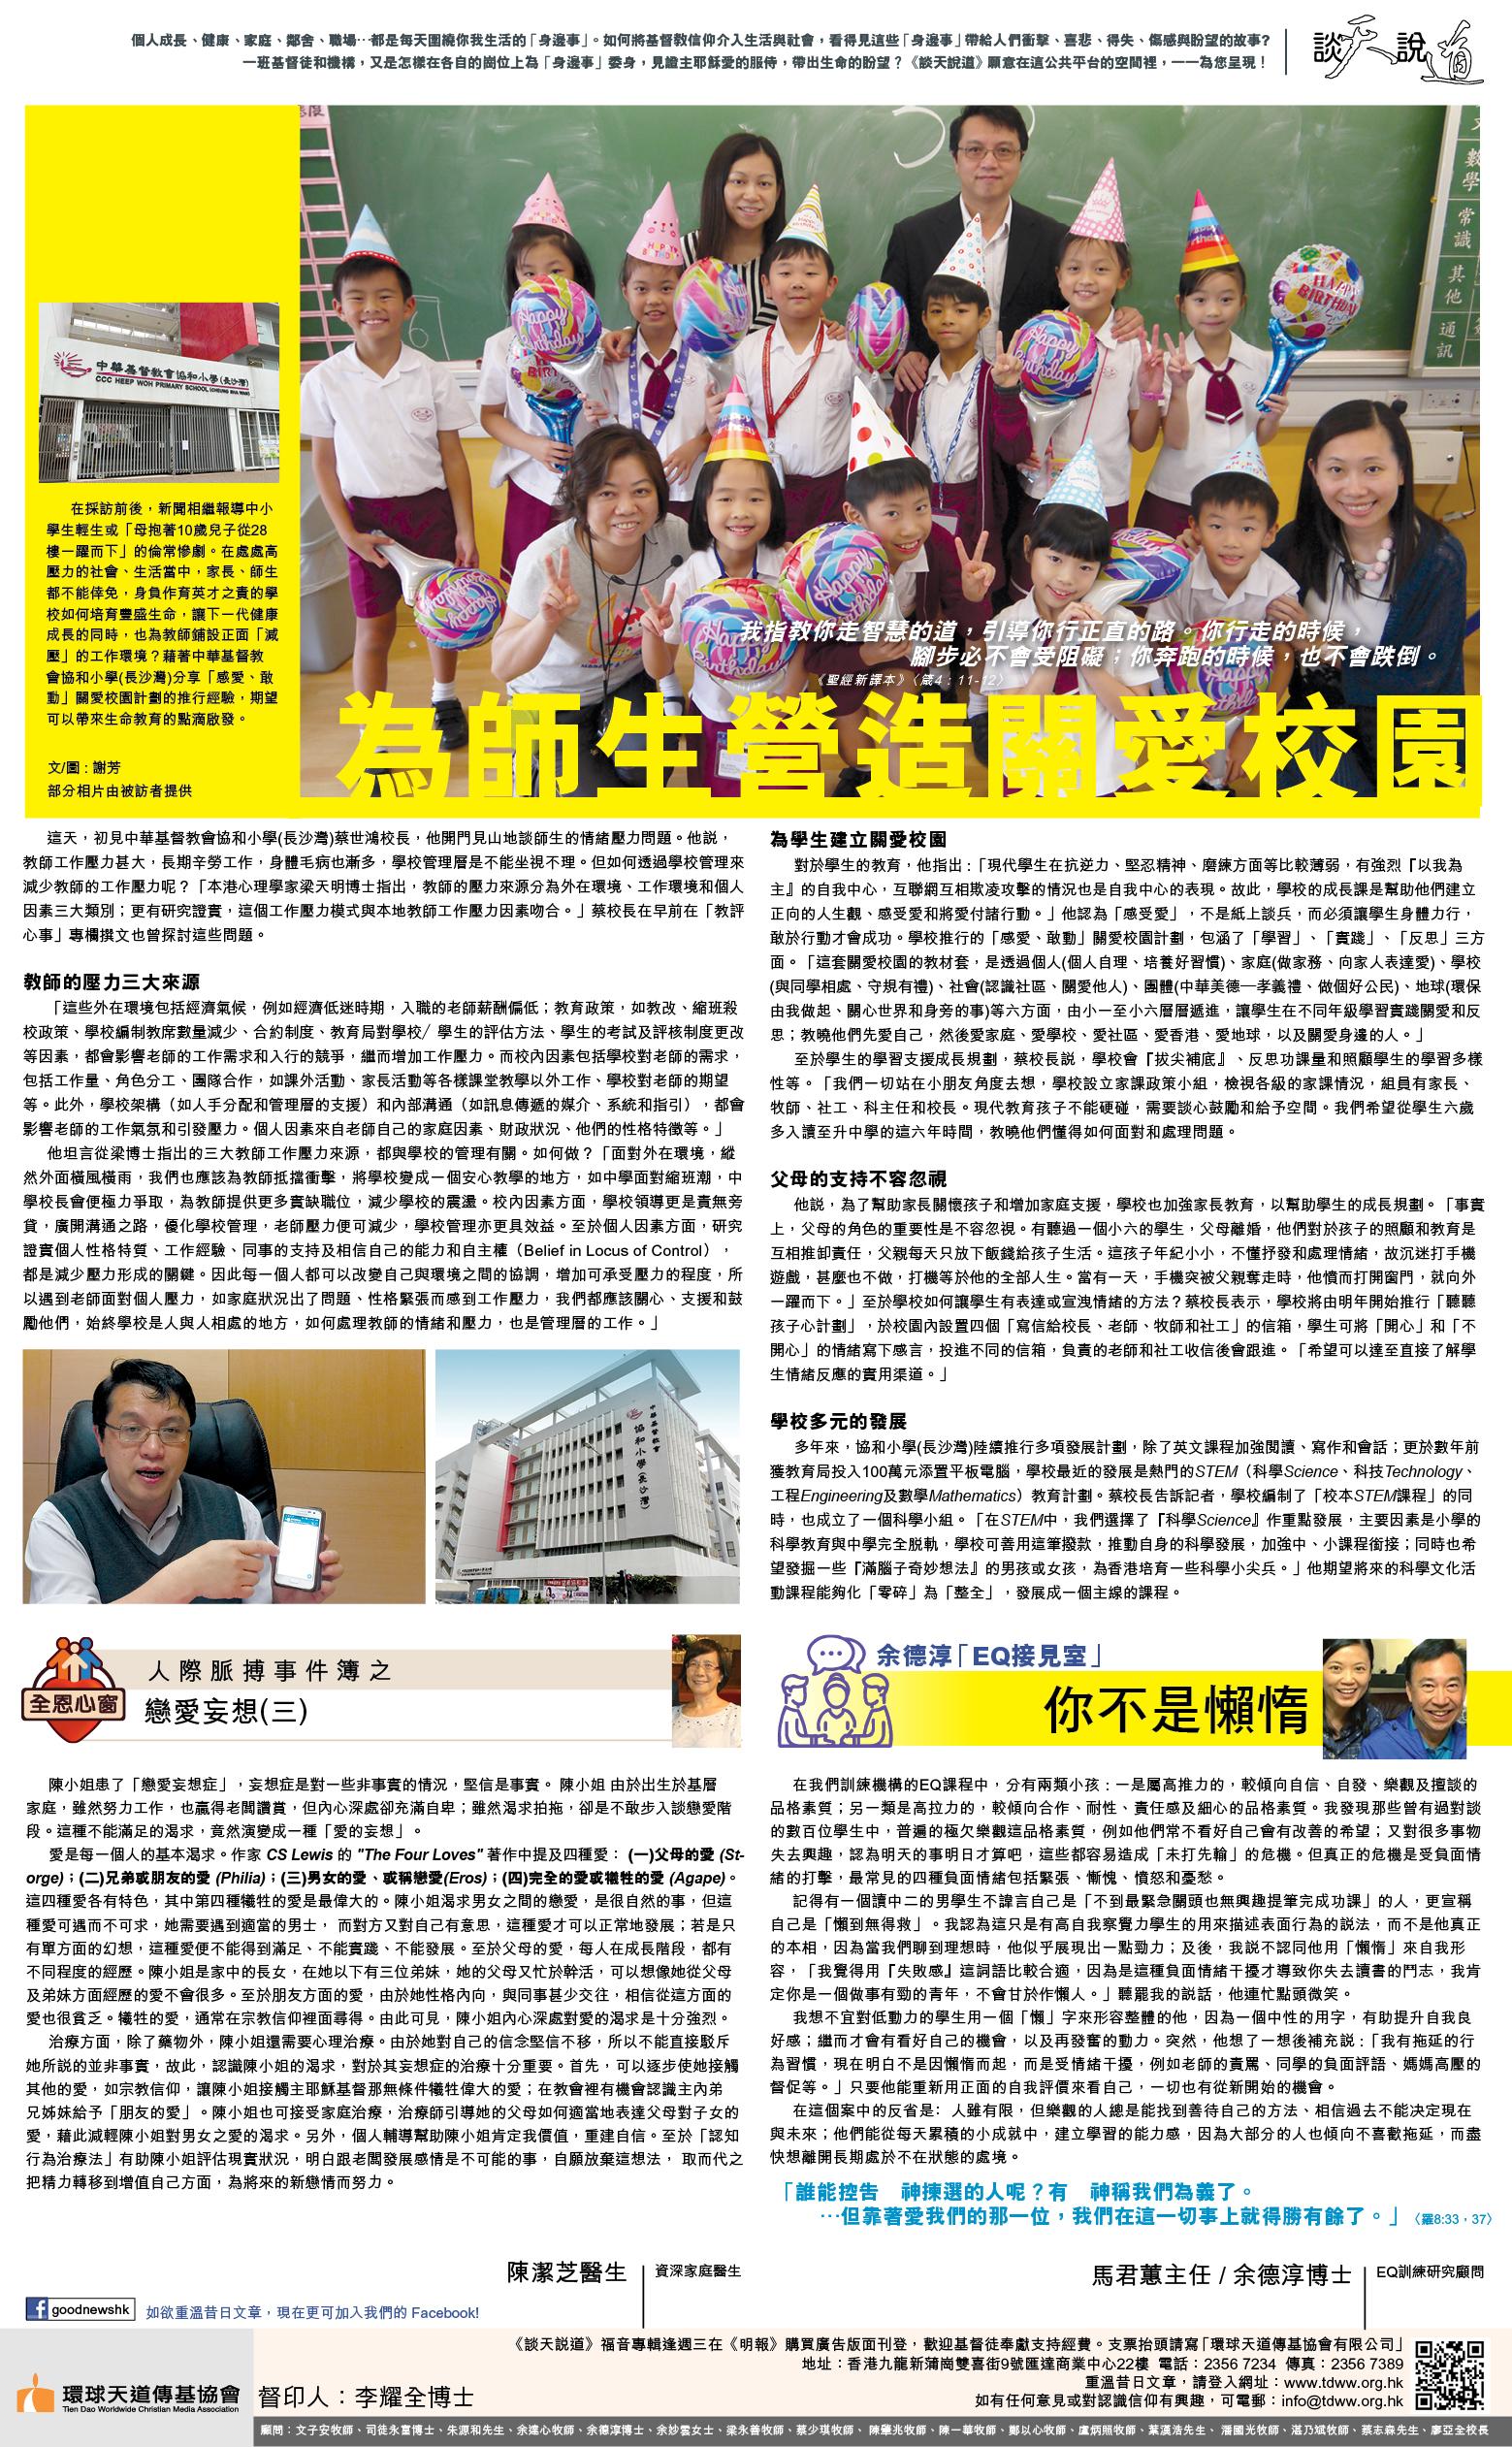 2017July14為師生營造關愛校園.jpg